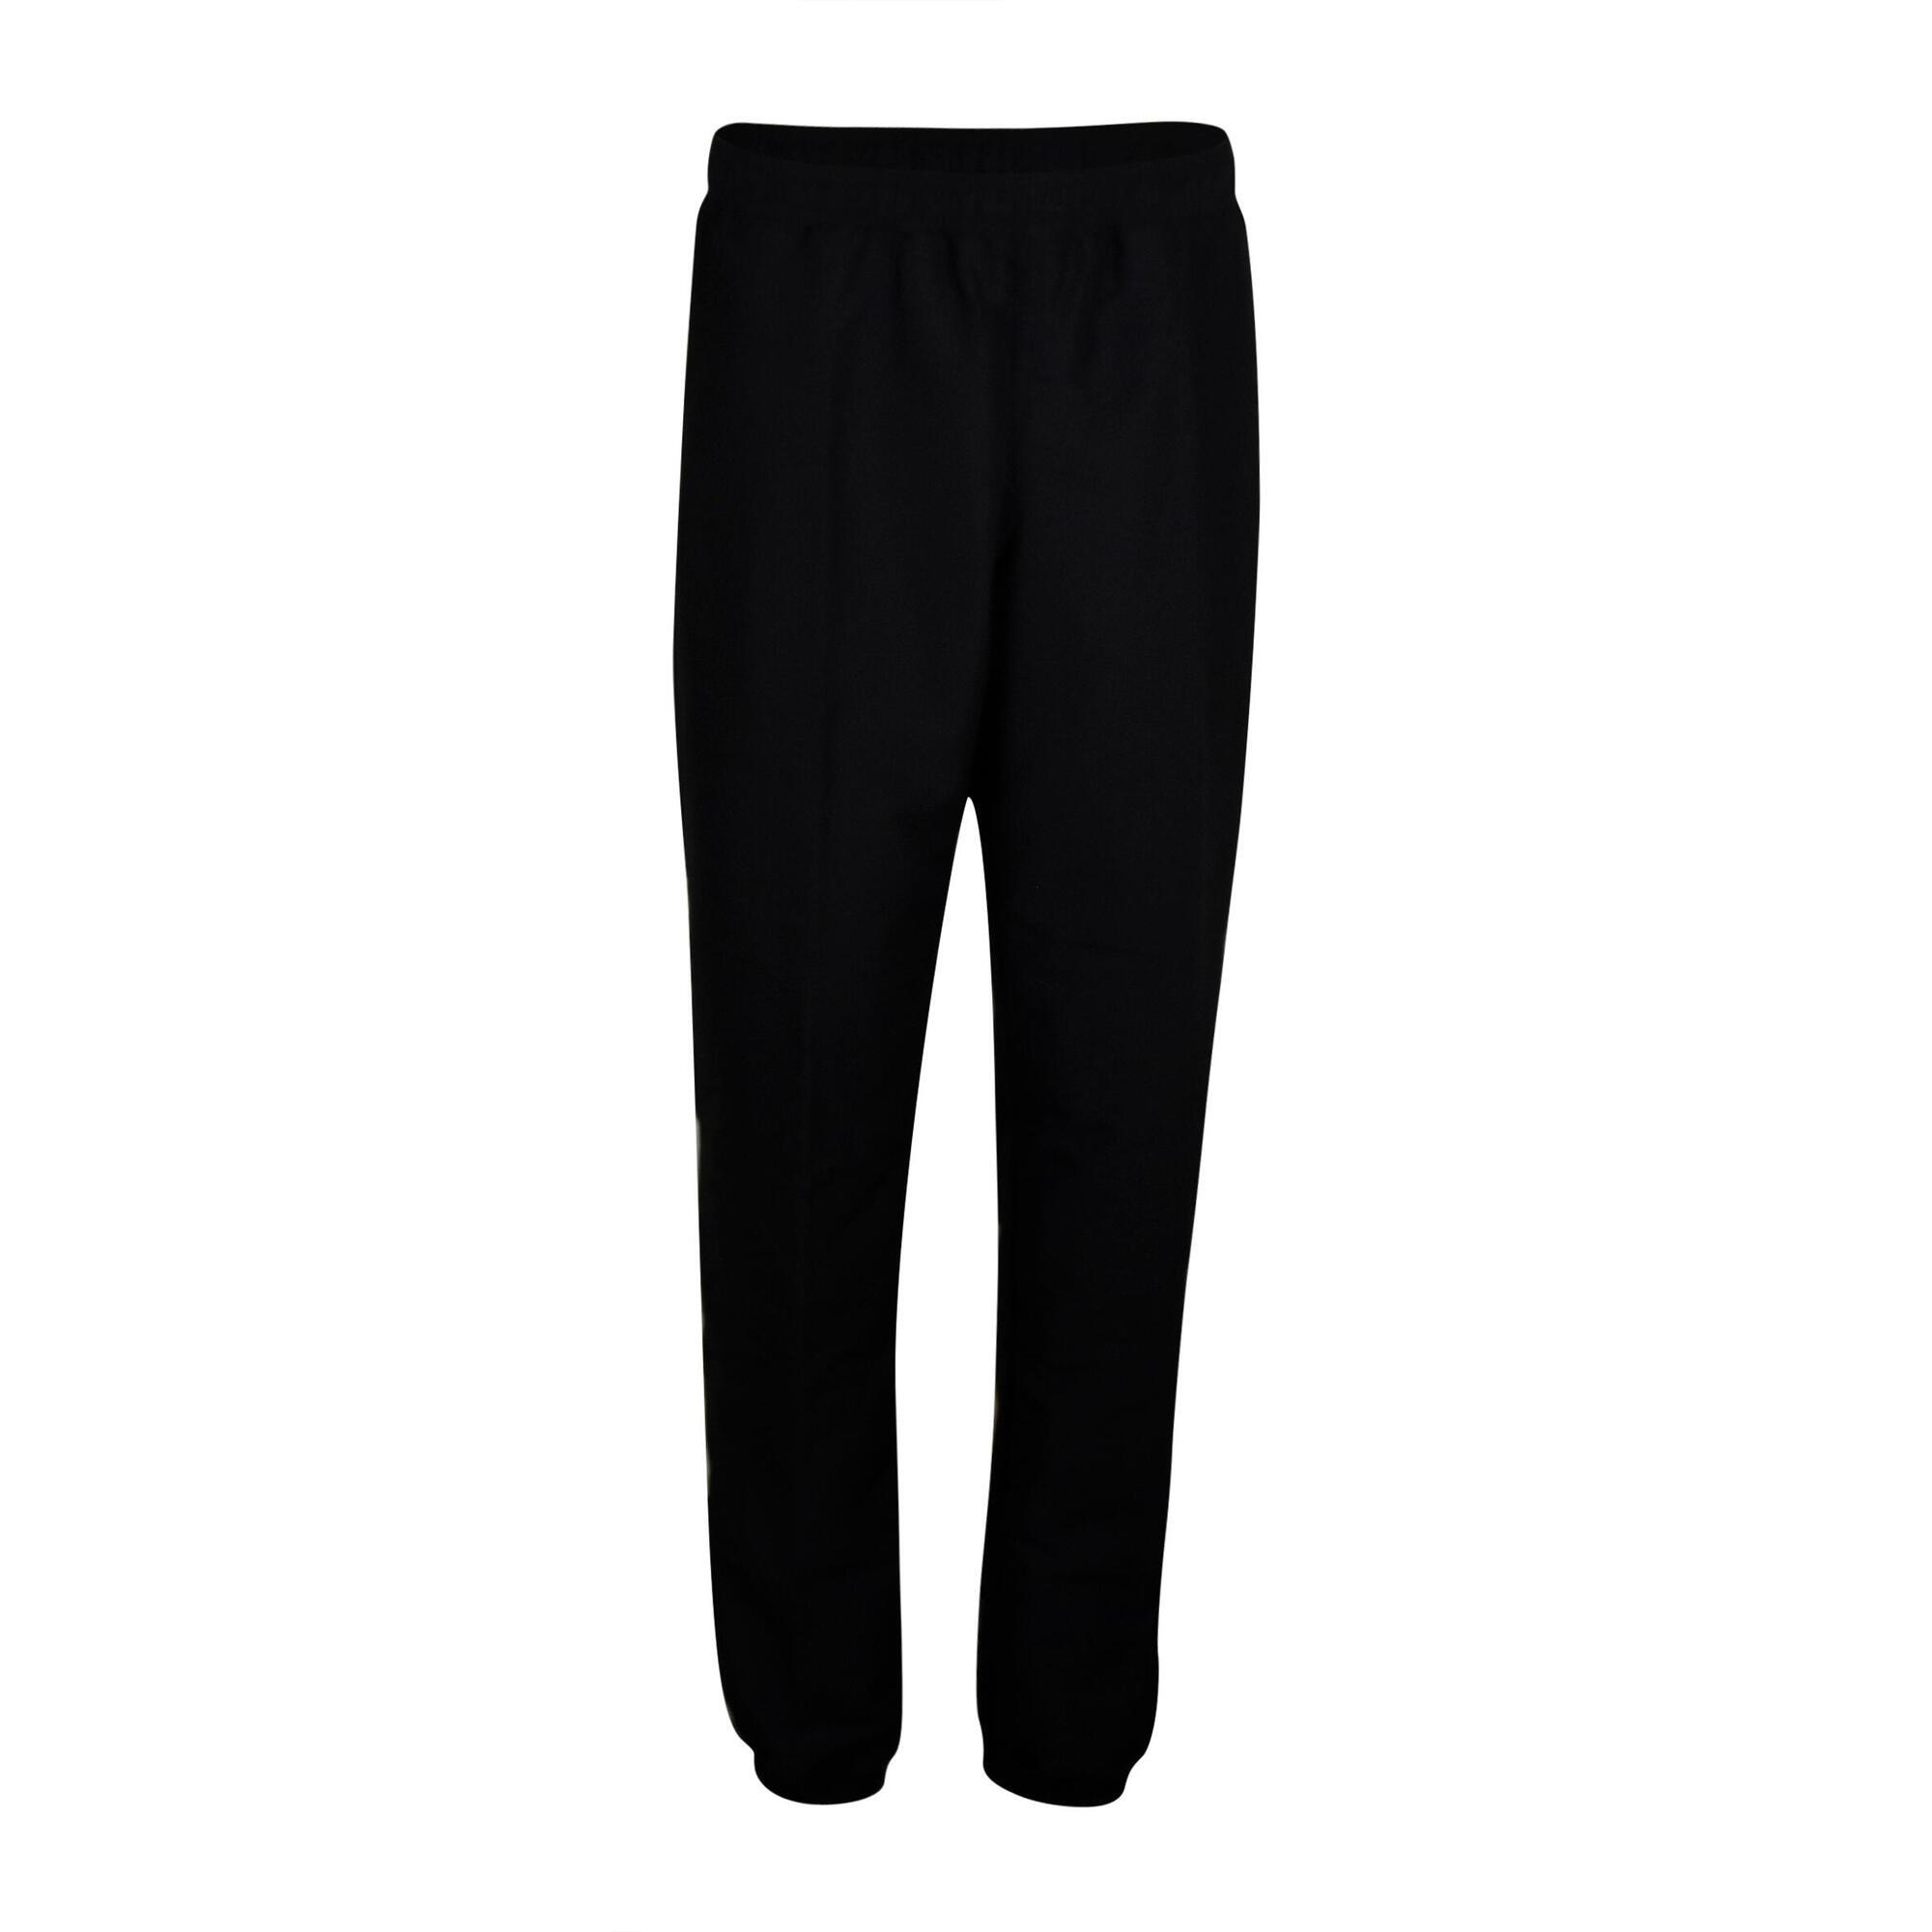 pantalon fitness cardio homme noir fpa100 domyos by. Black Bedroom Furniture Sets. Home Design Ideas